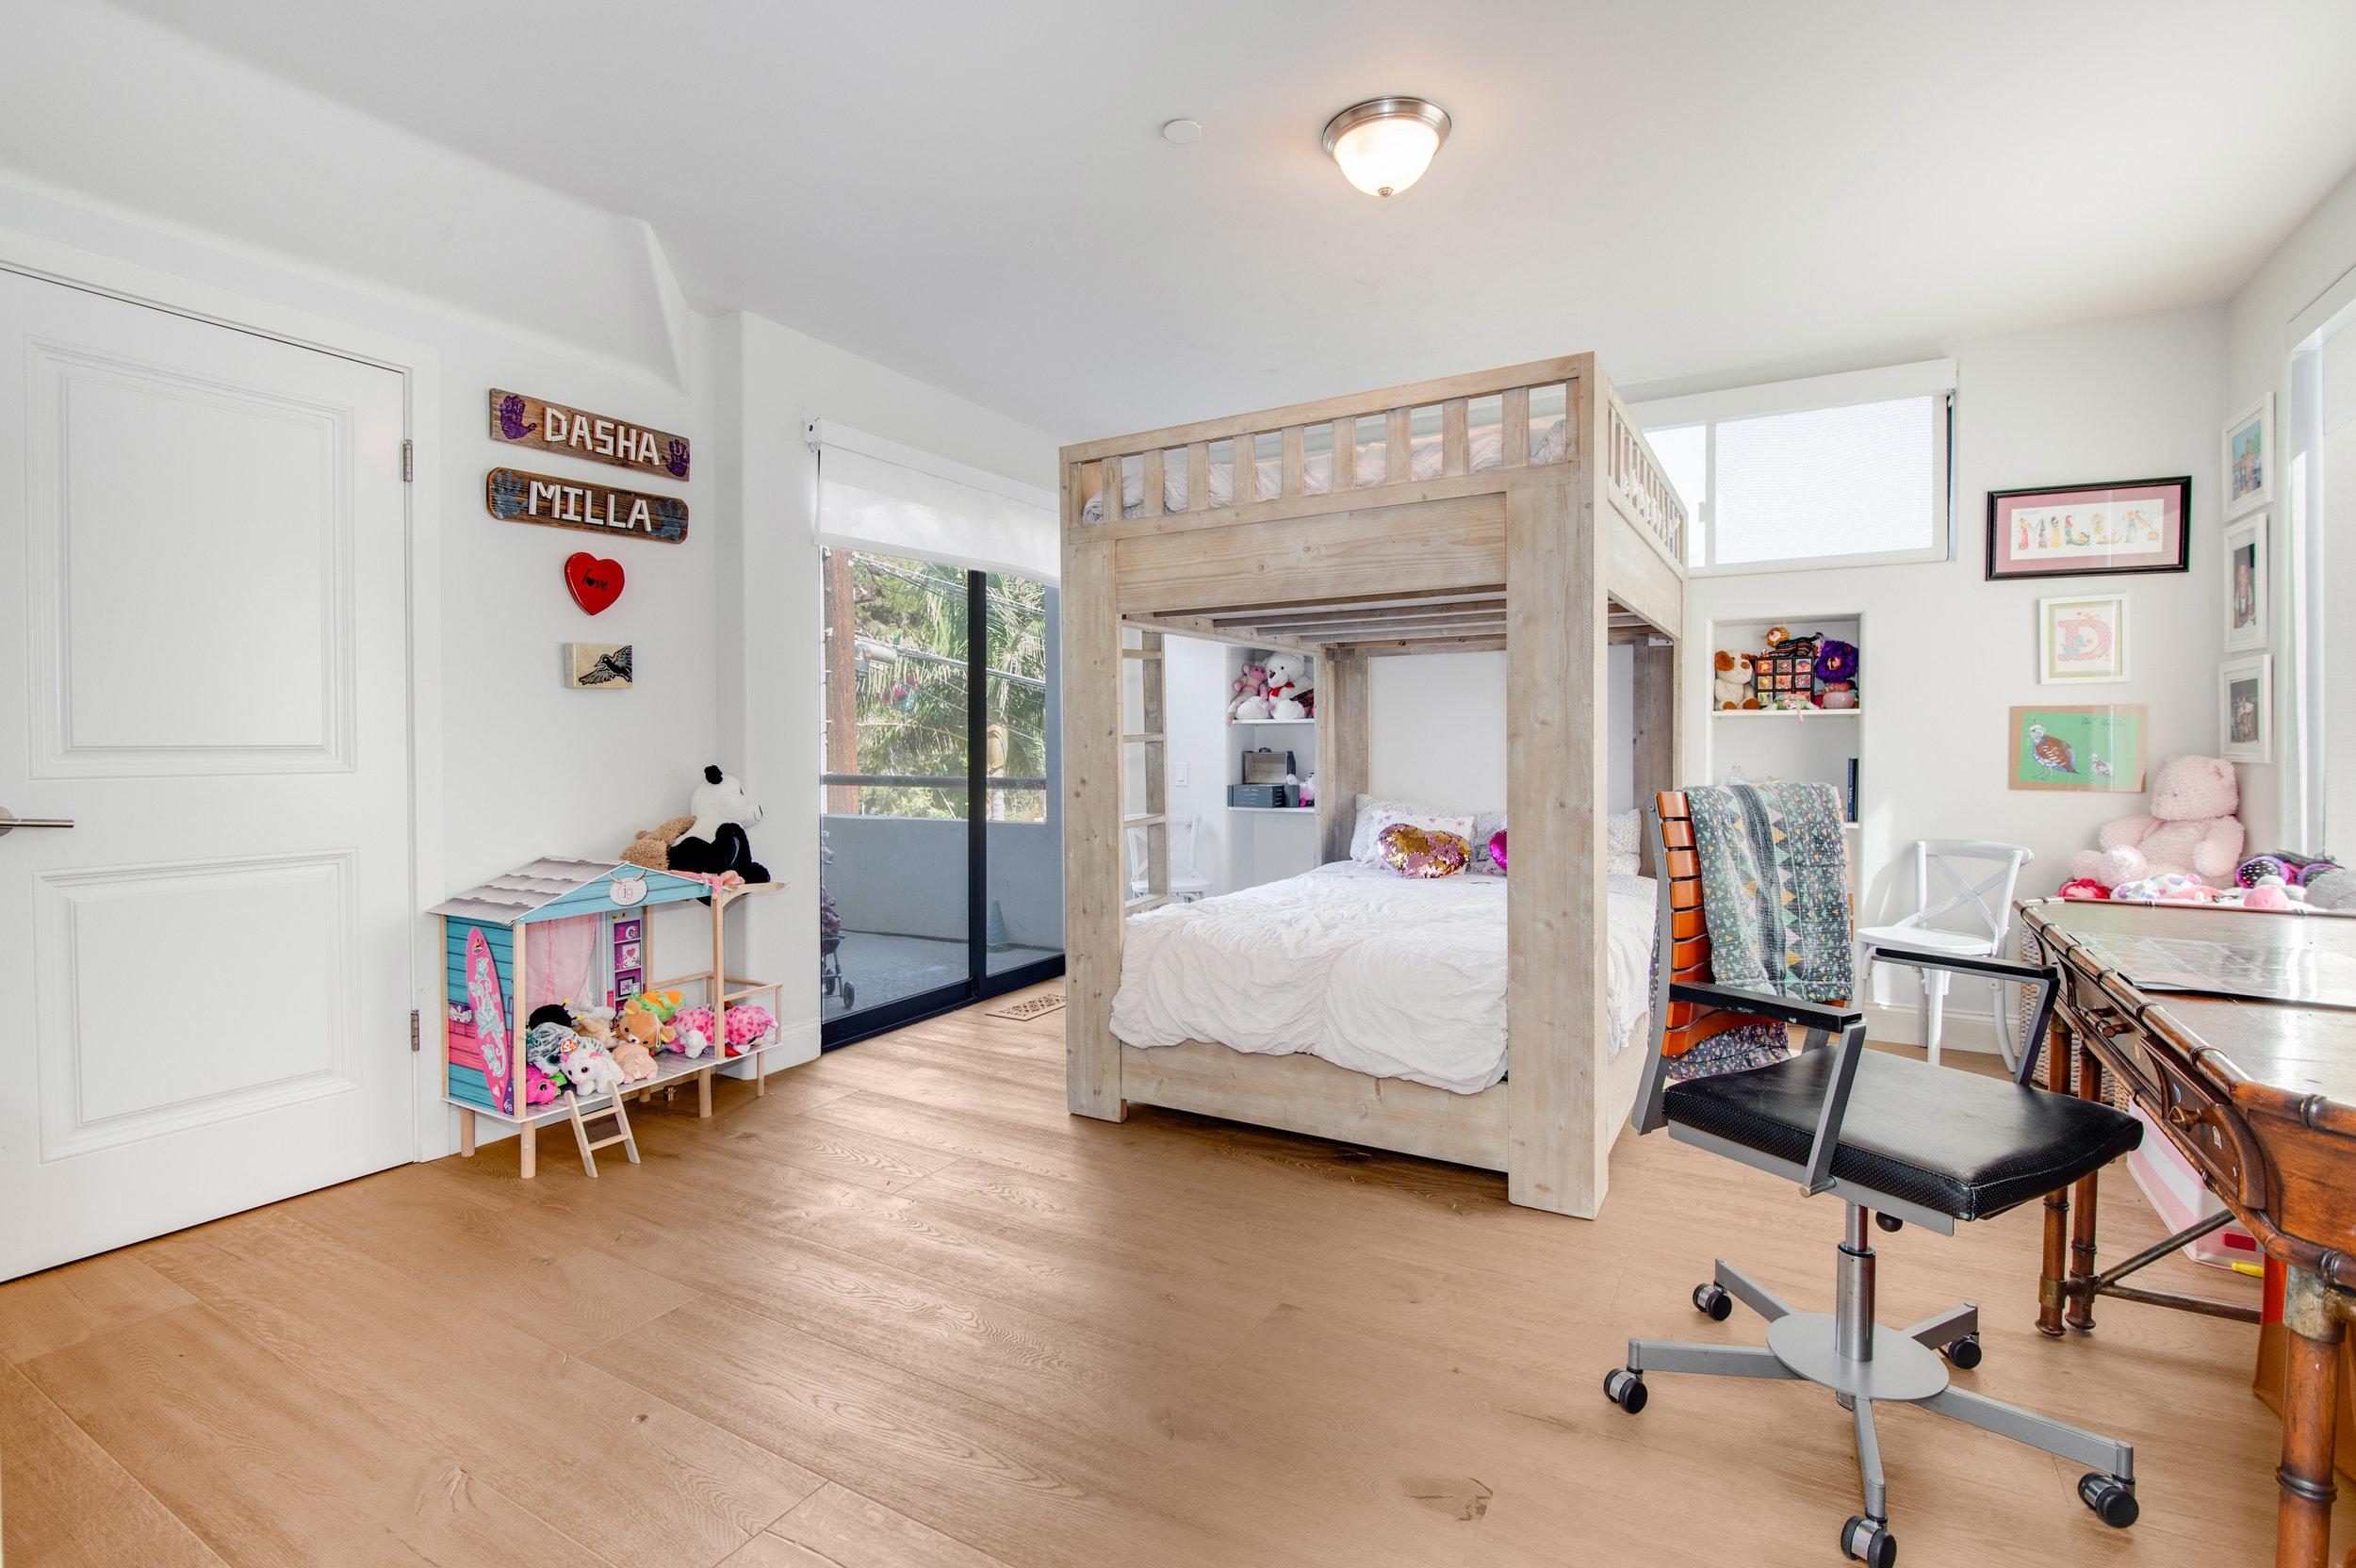 021 Bedroom 25252 Malibu Road For Sale Lease The Malibu Life Team Luxury Real Estate.jpg